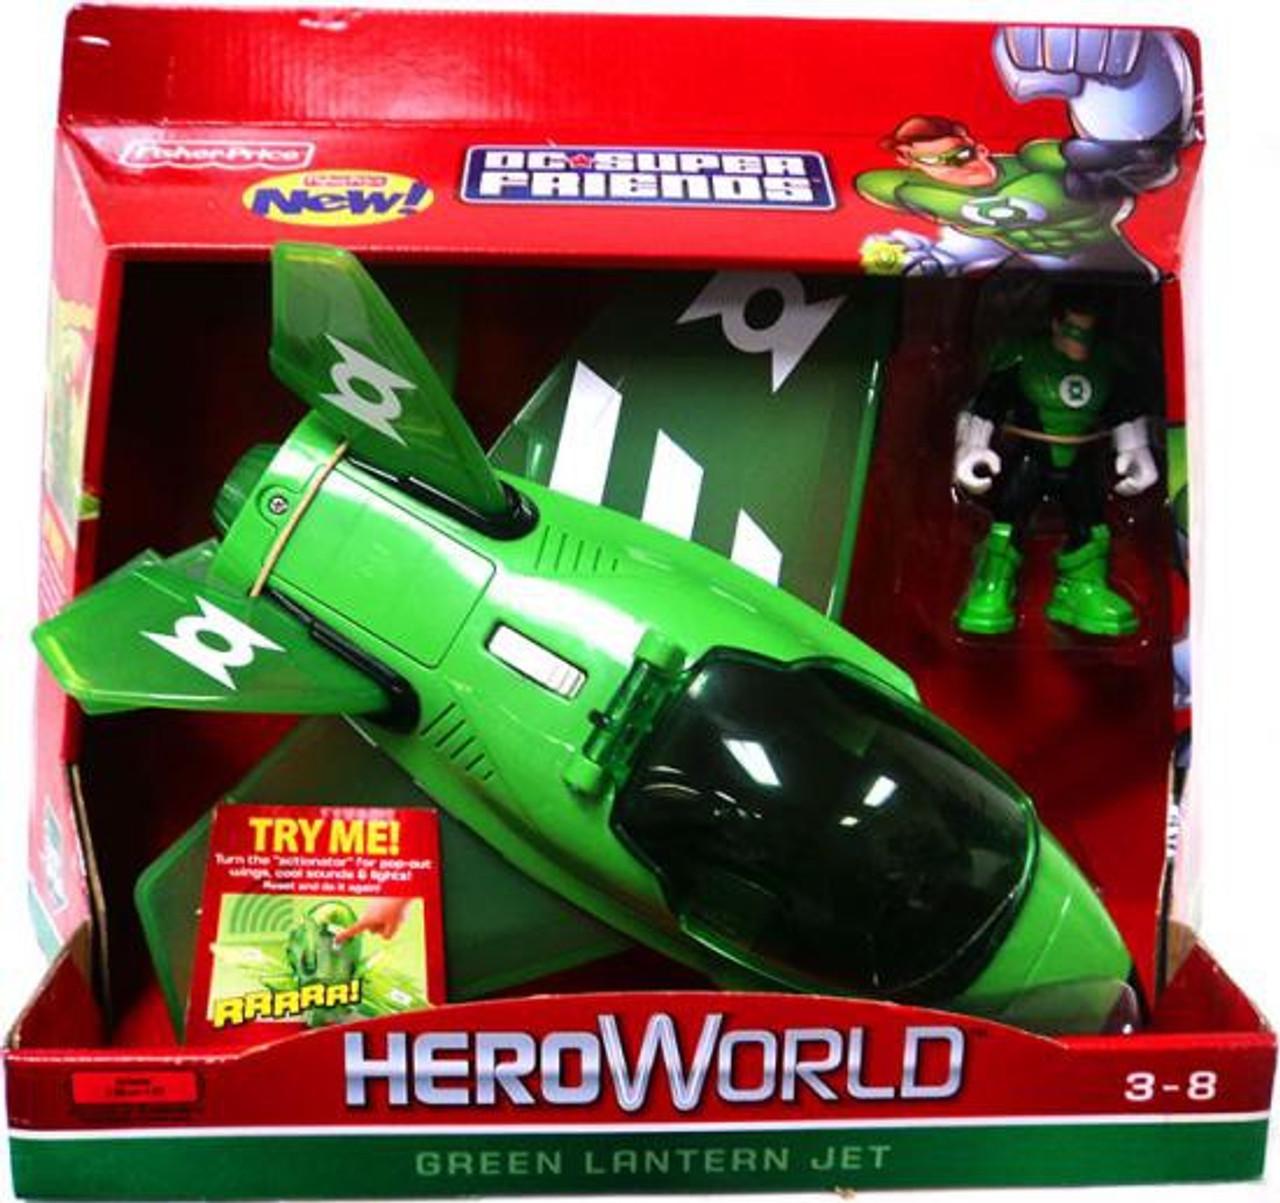 Fisher Price DC Super Friends Hero World Green Lantern Jet Action Figure Vehicle